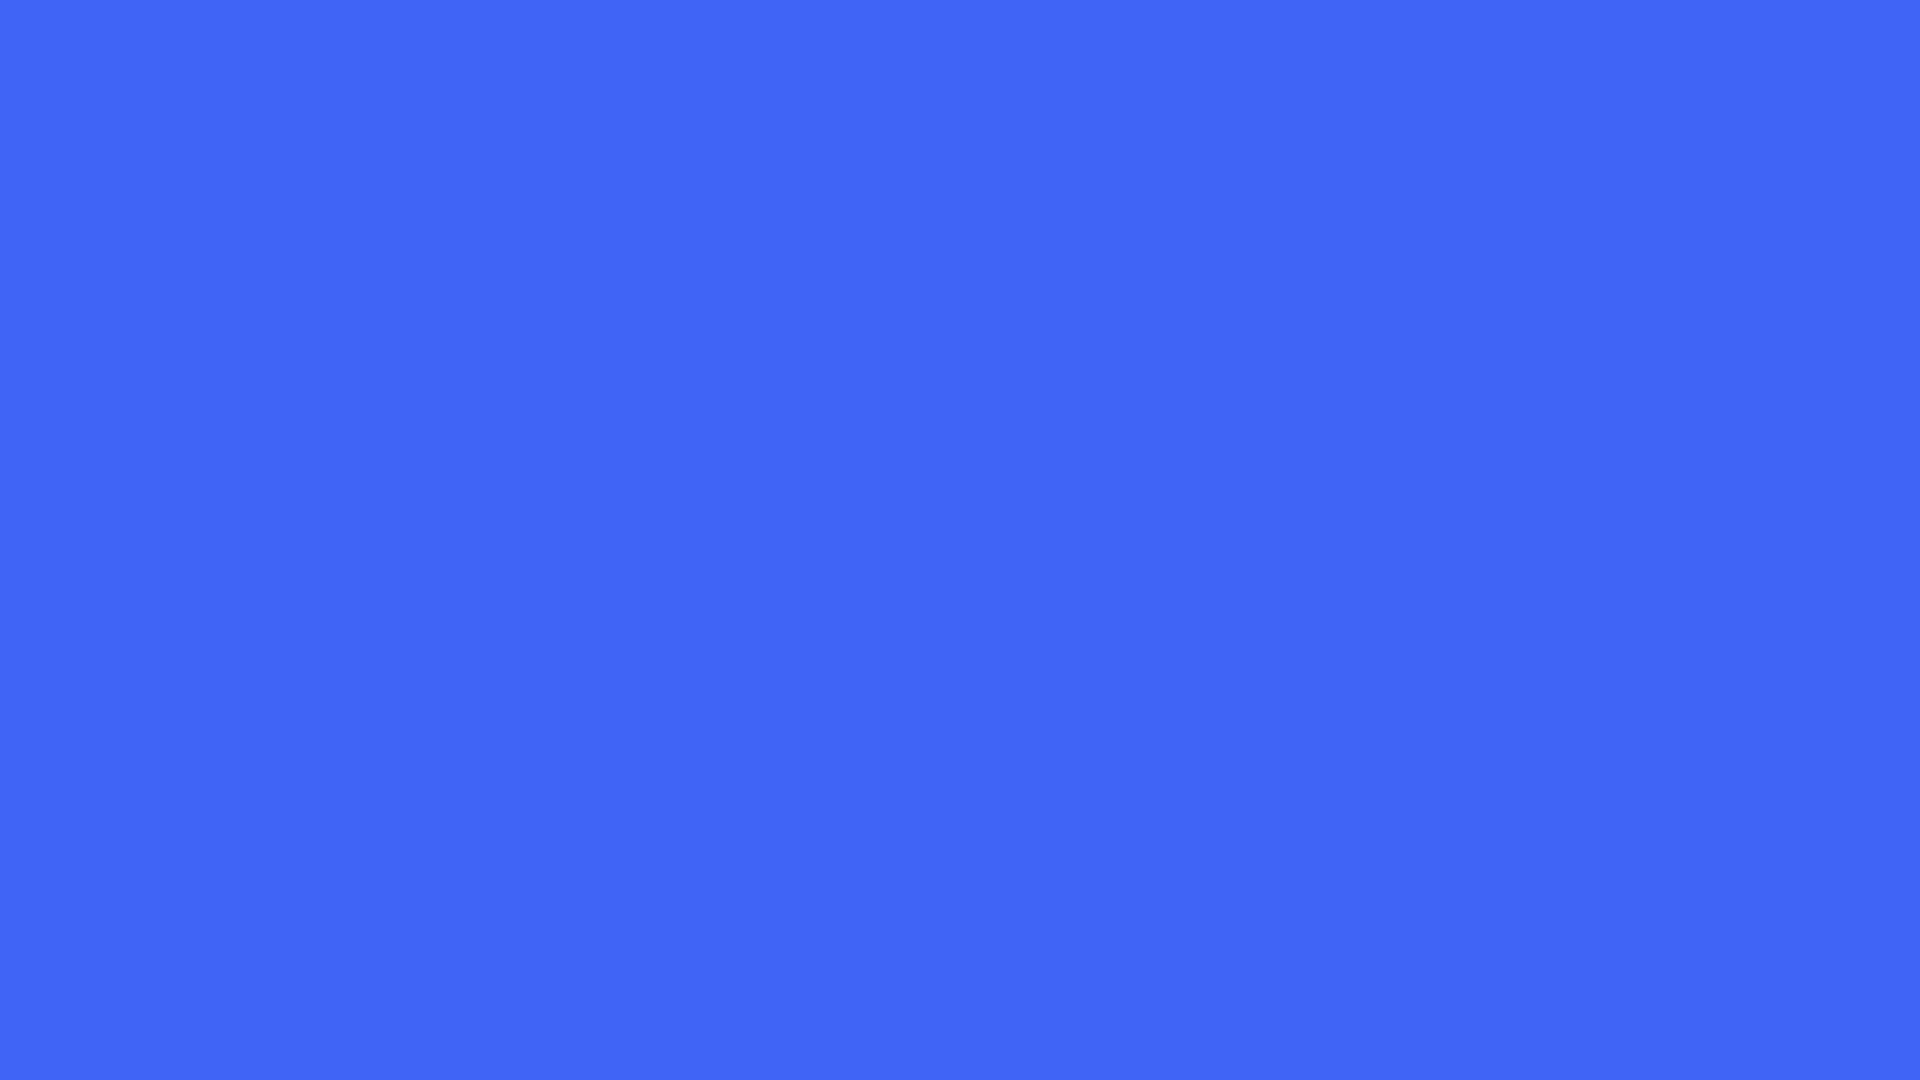 1920x1080 Ultramarine Blue Solid Color Background